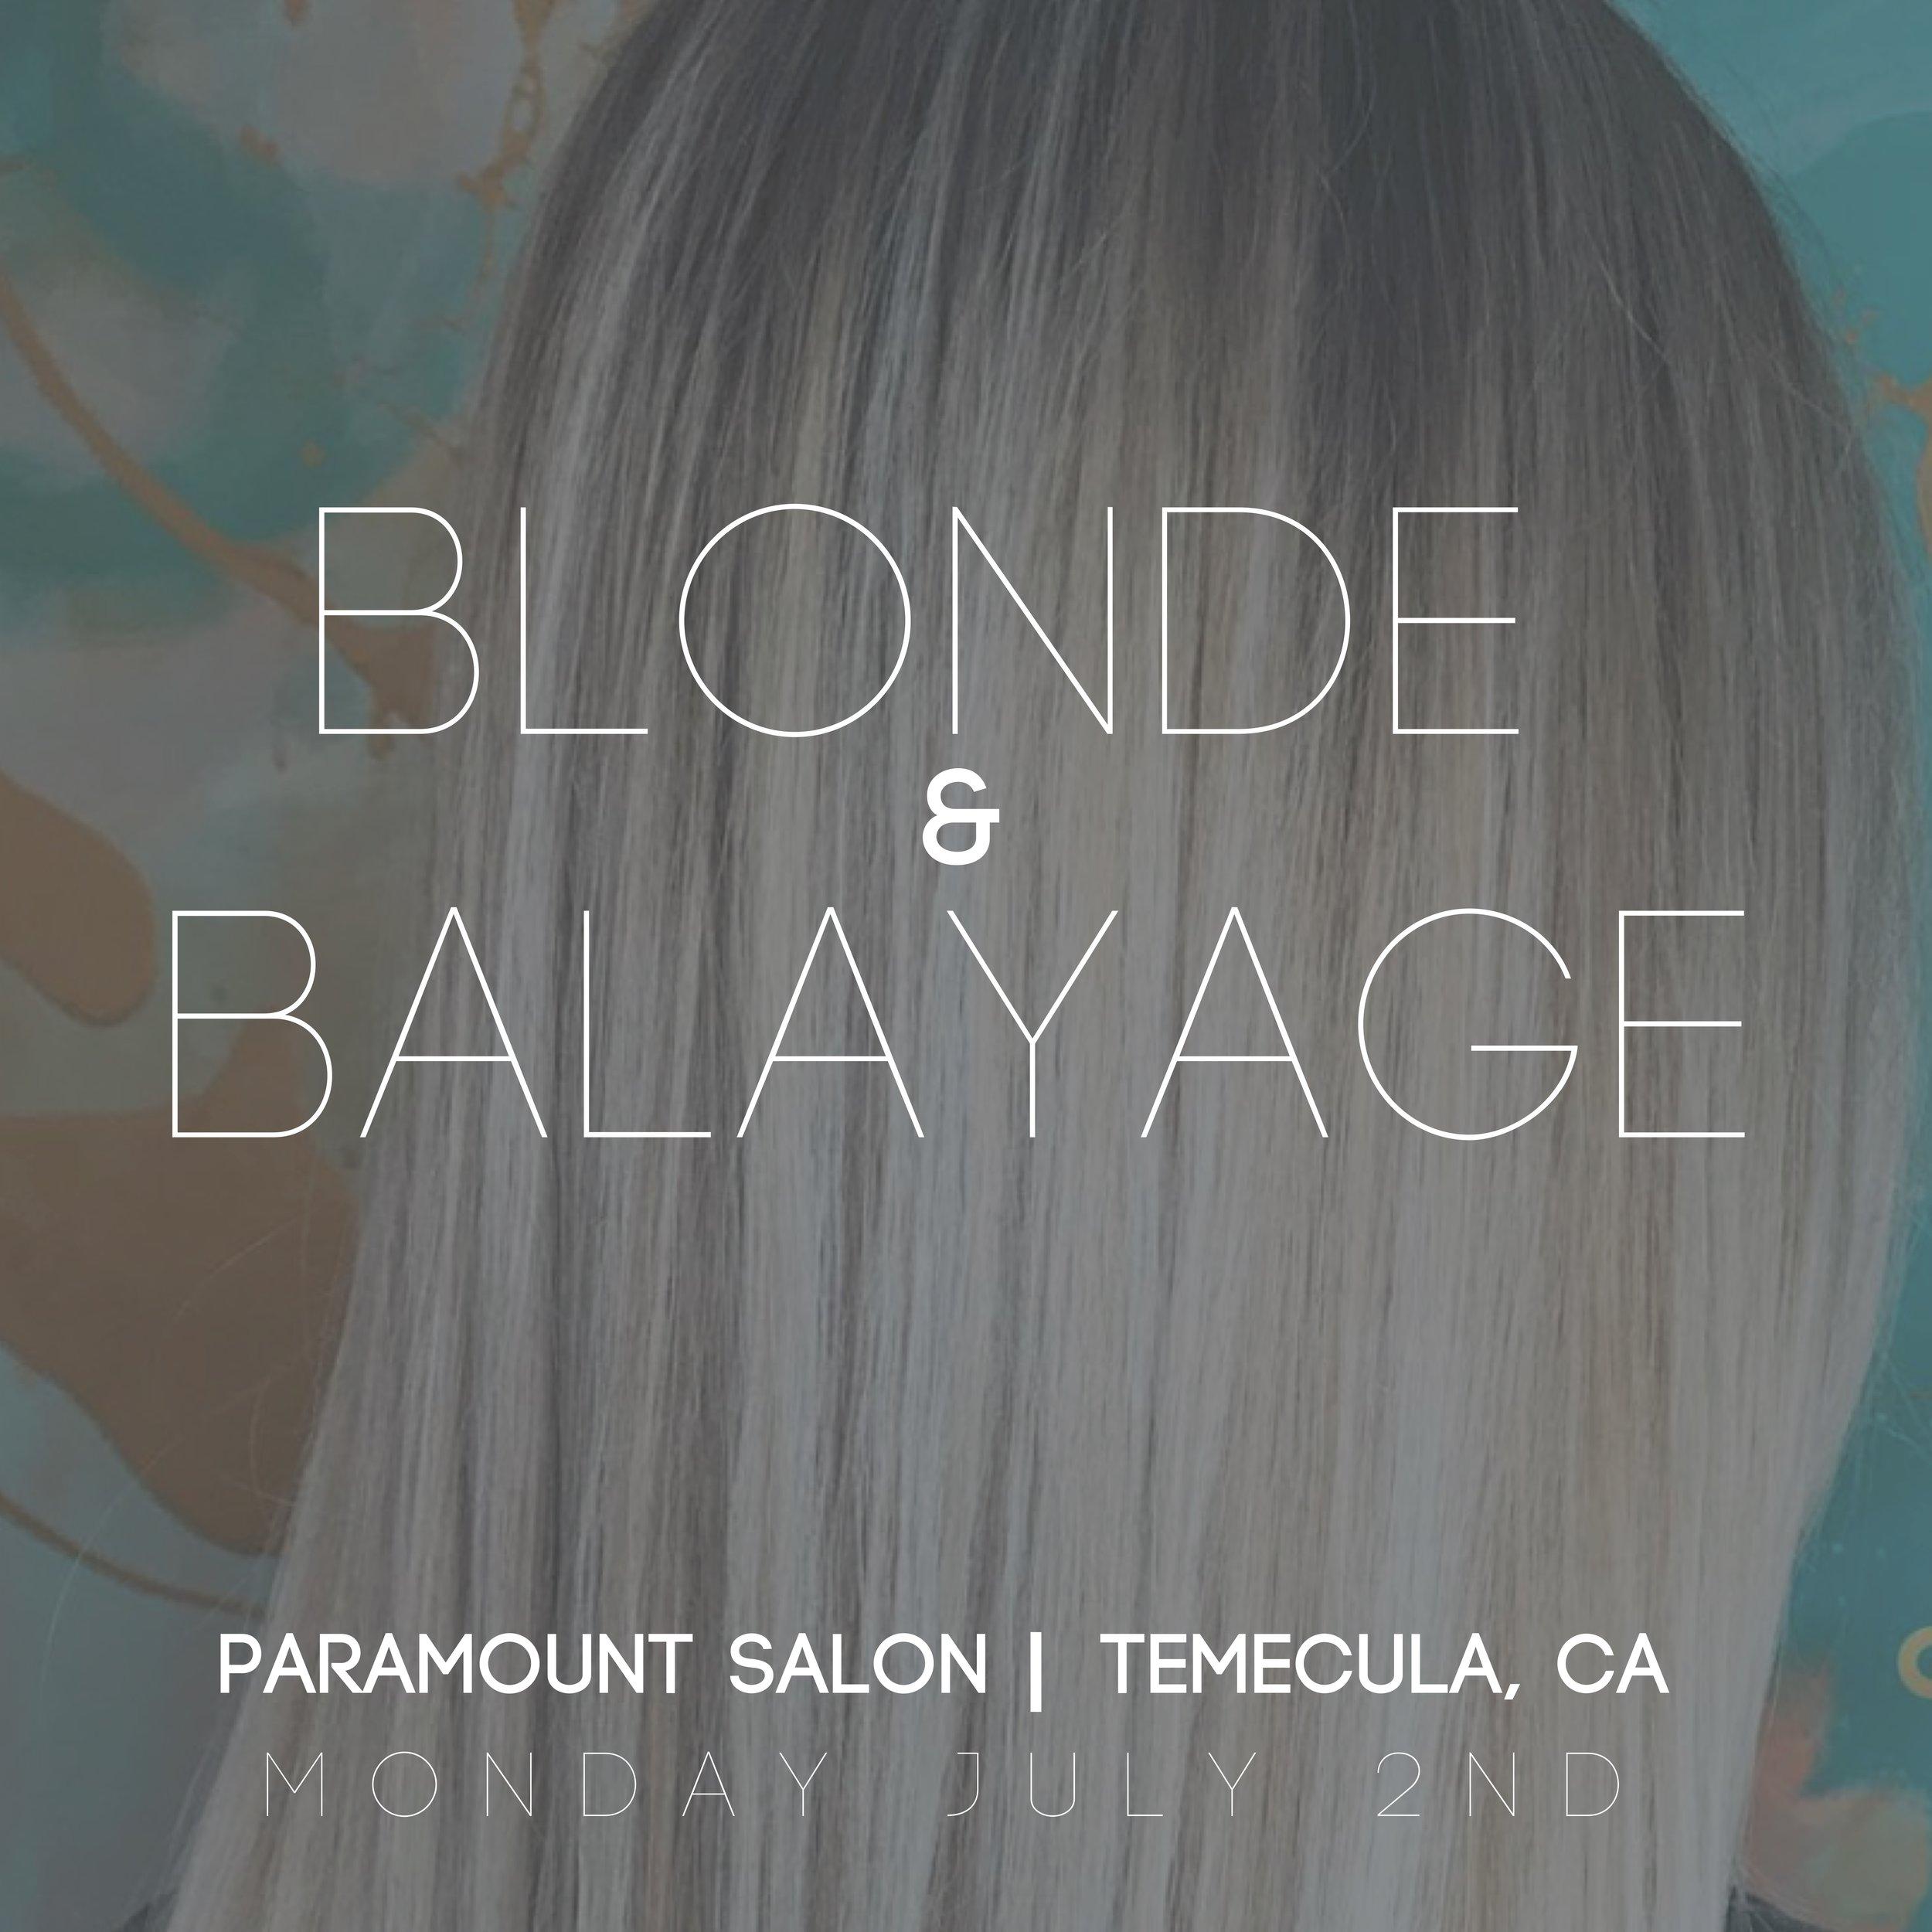 180702 Blonde and Balayage.JPG